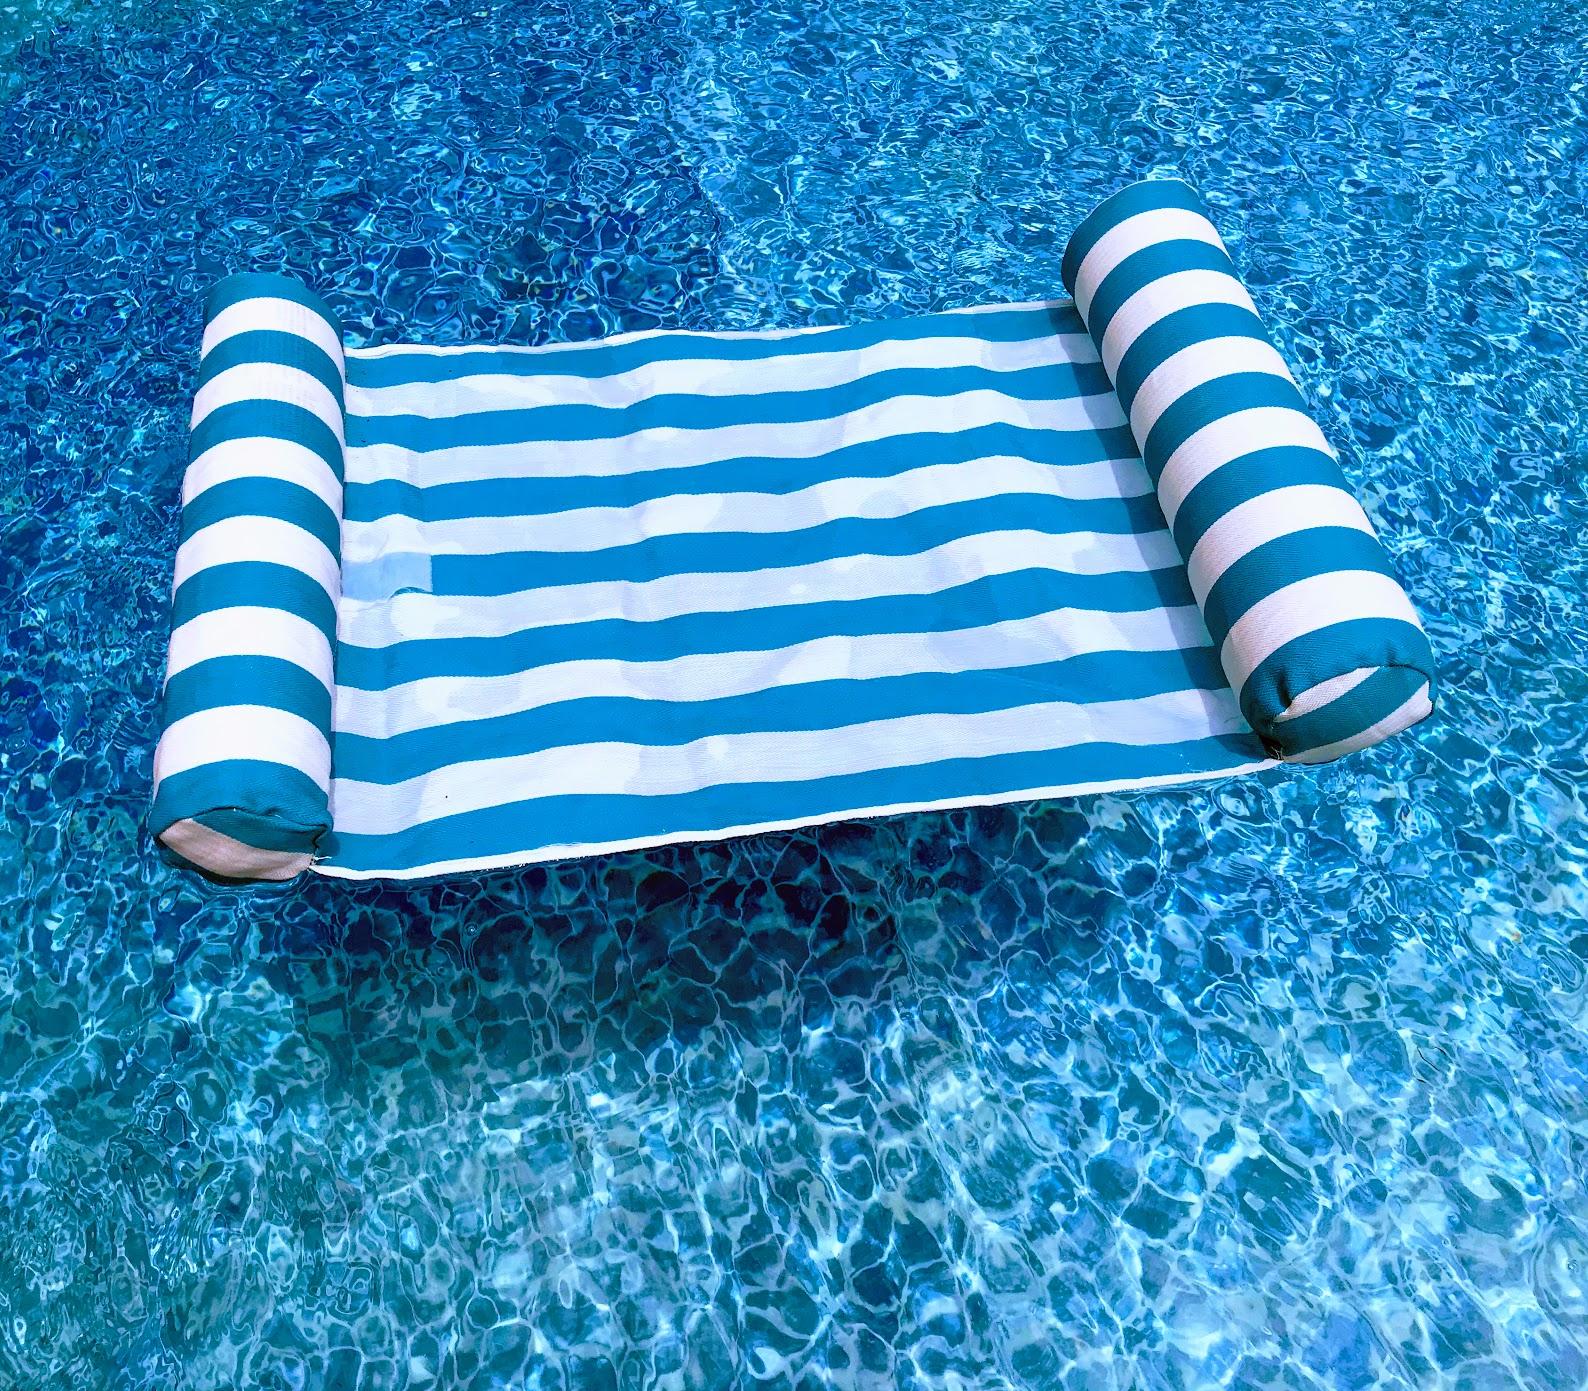 water hammock